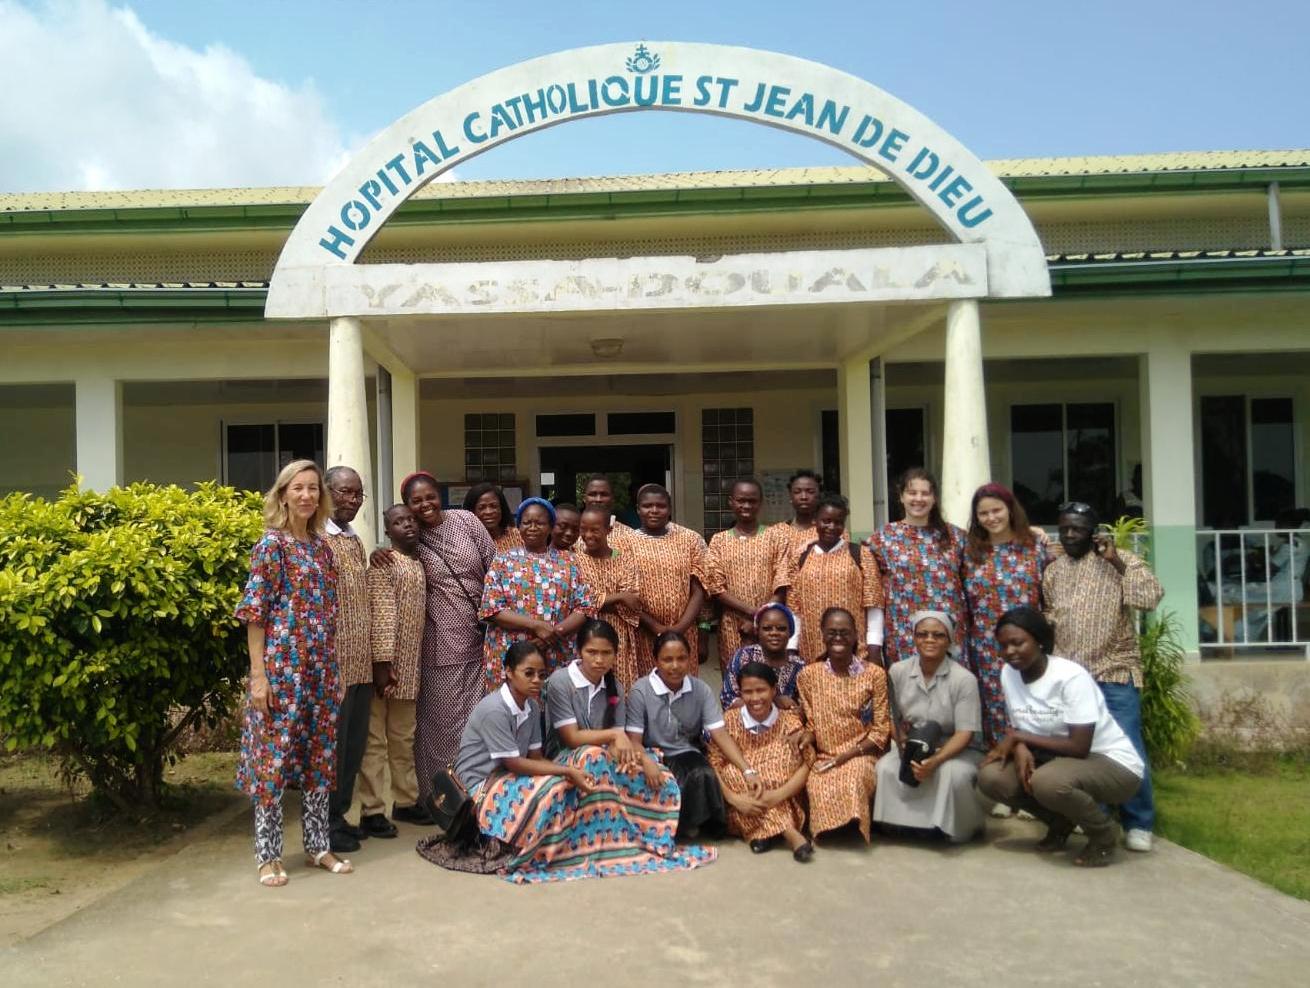 08_08_18_Maddi_Marko_e_Izaskum_Tejada_en_Camerun_con_las_Hermanas_Hospitalarias__1_.jpg